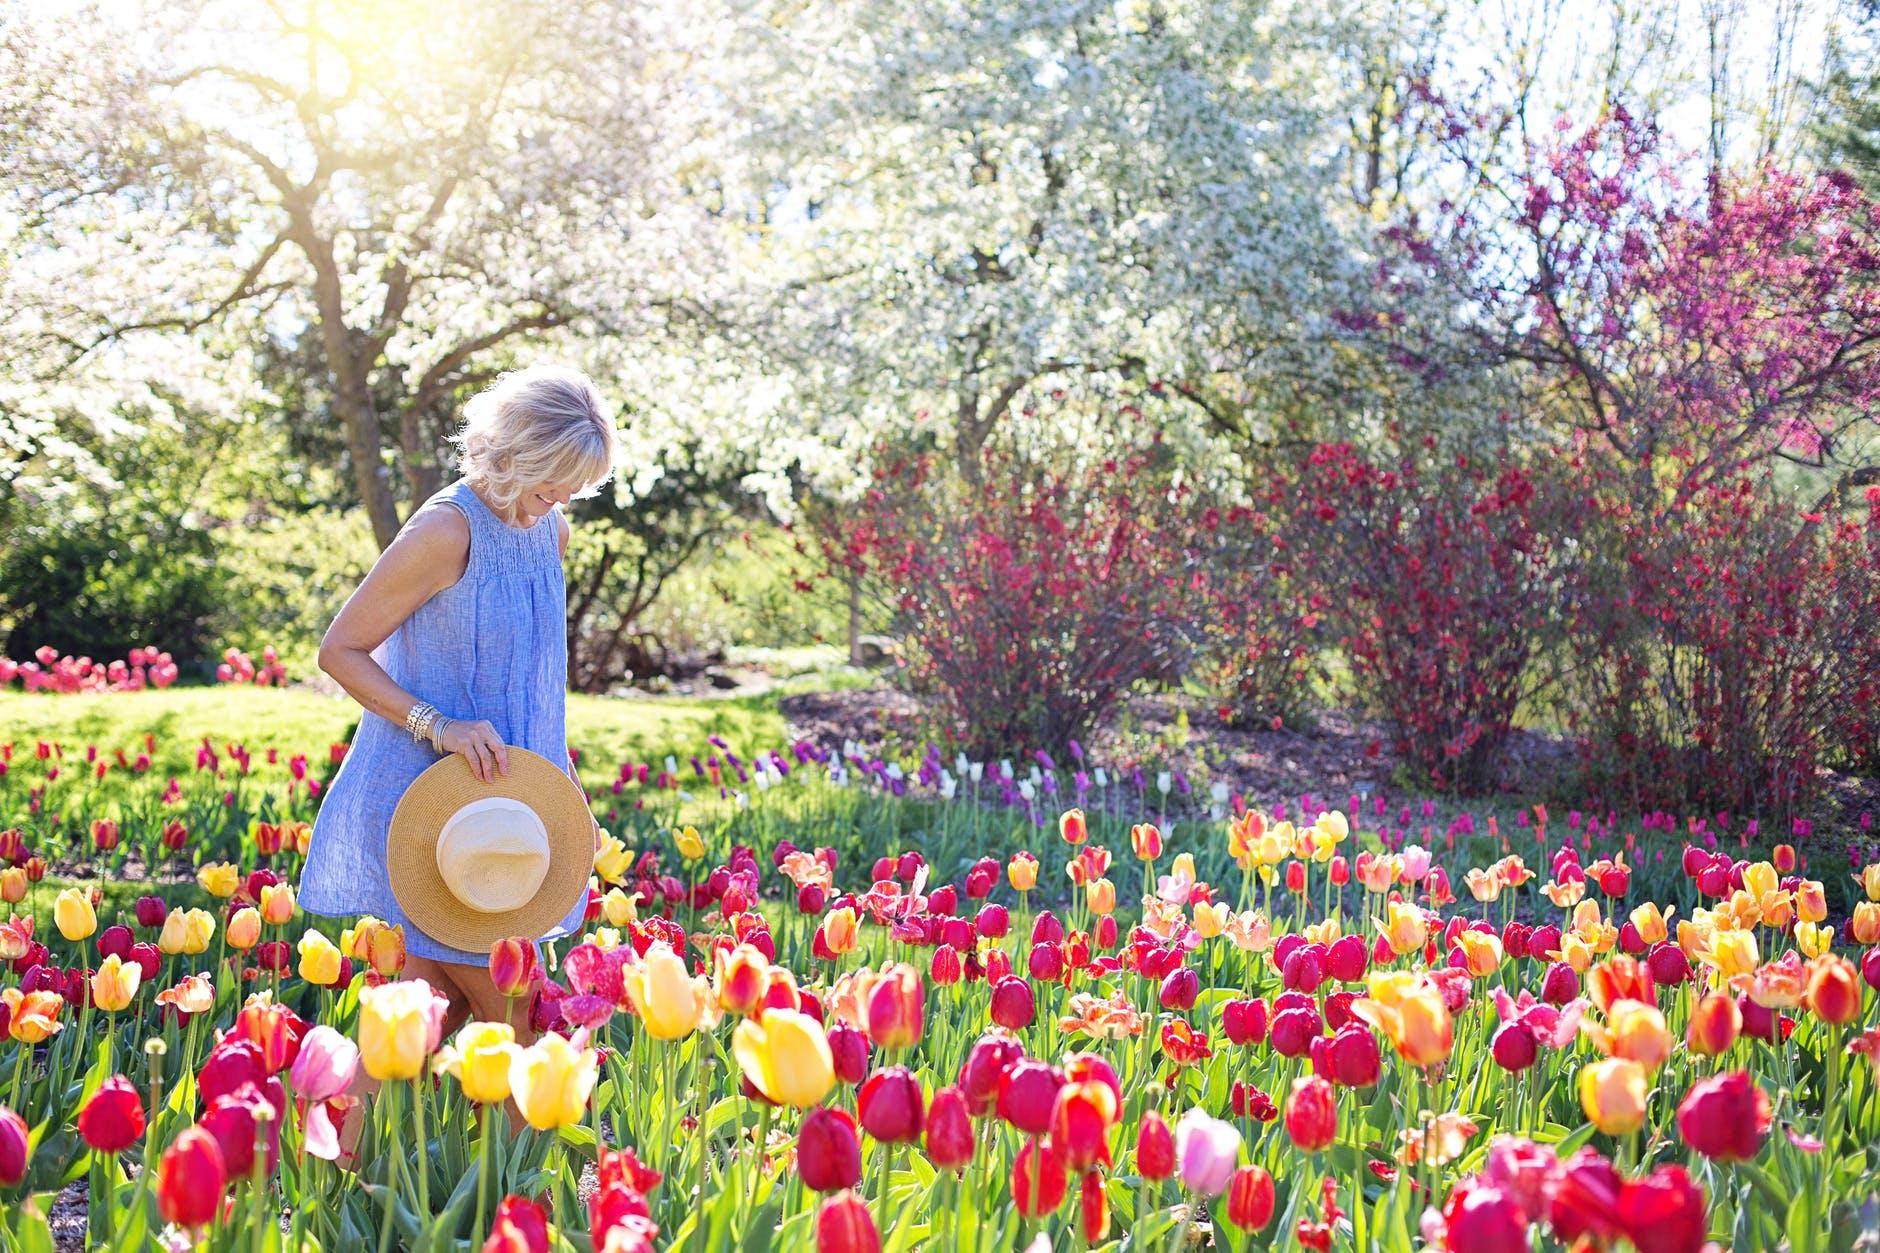 garden features woman walking on bed of tulip flowers